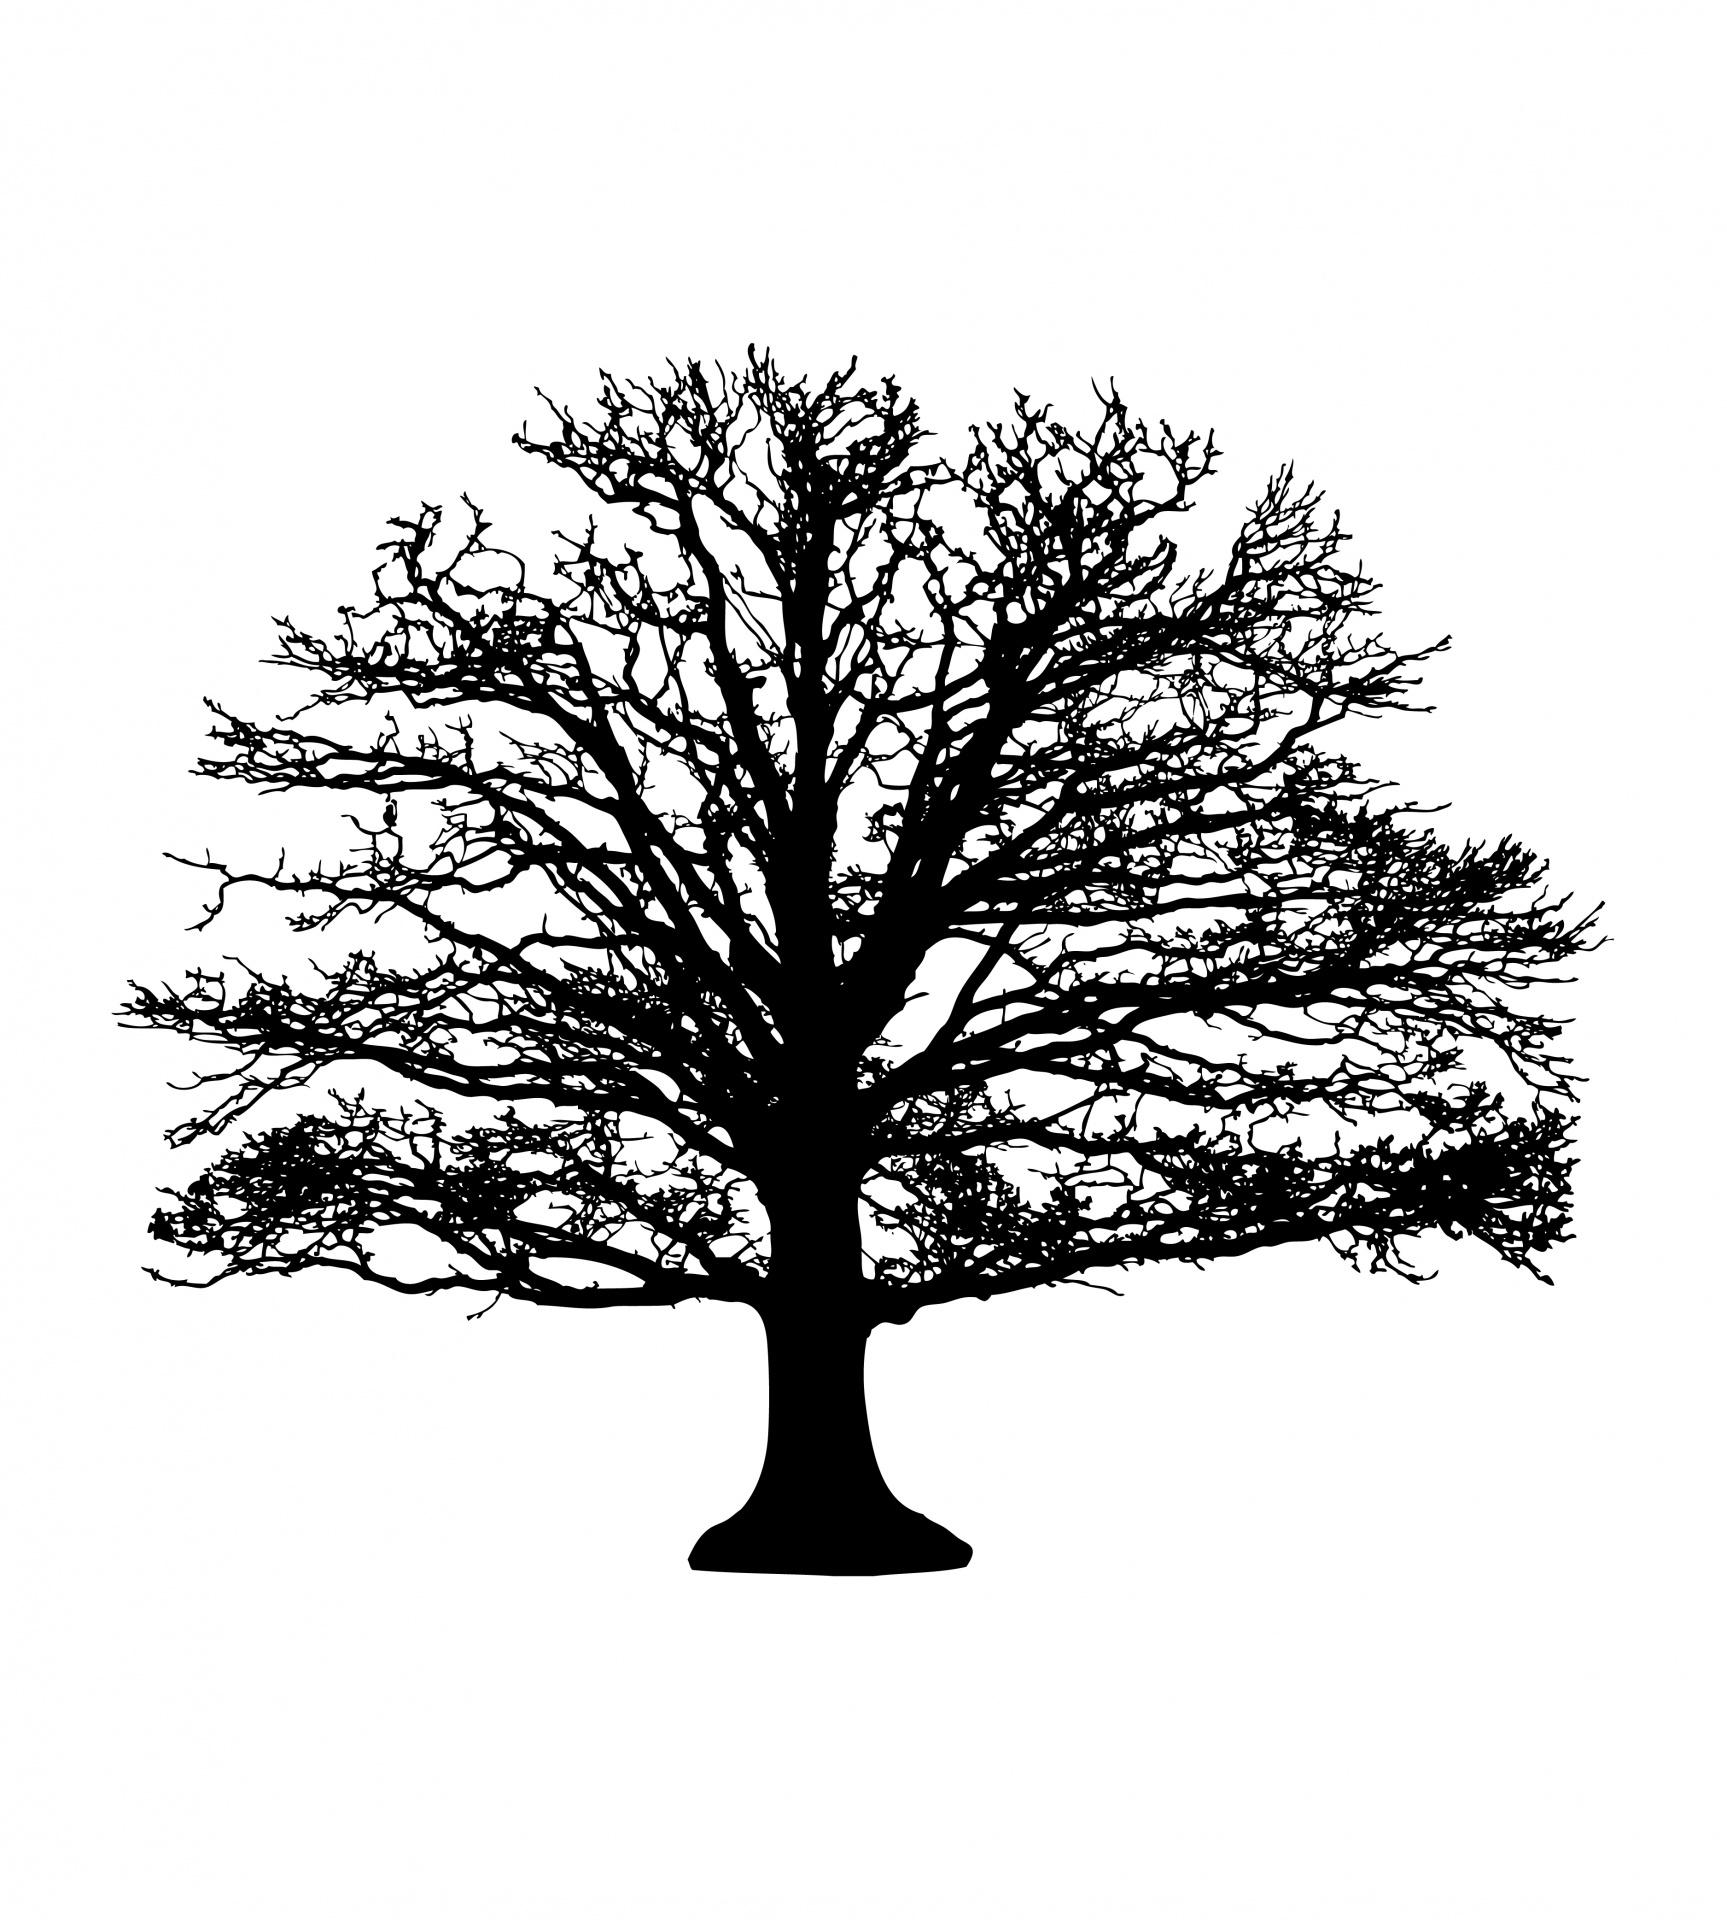 Tree Silhouette Free Stock Photo